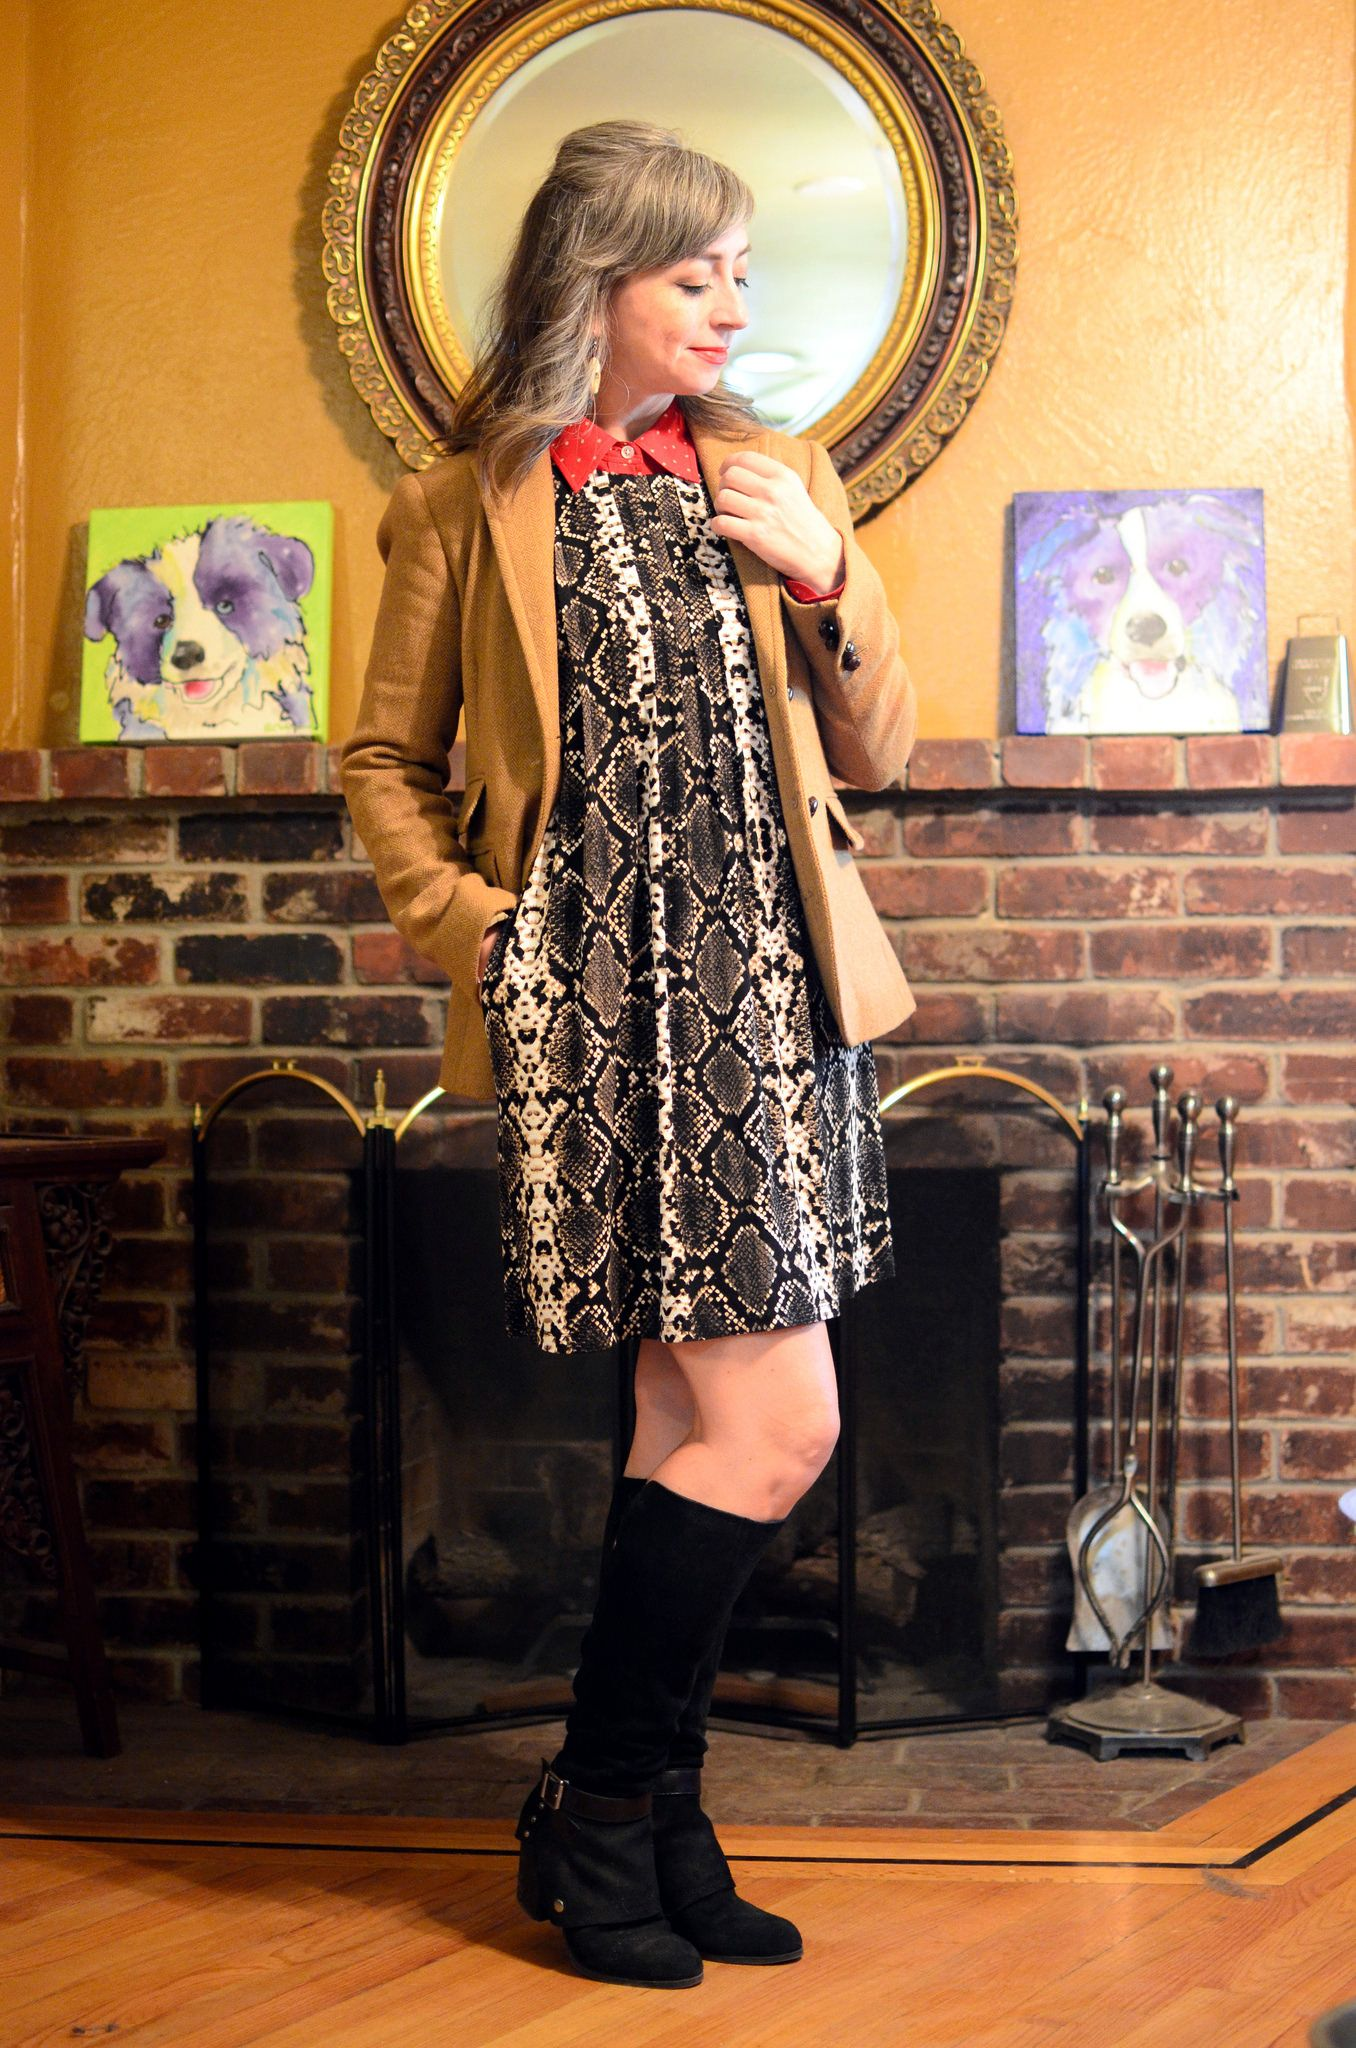 ace1914b9004c Blazer, J Crew (consignment). Dress, Calvin Klein (thrifted). Blouse,  Lauren Ralph Lauren (thrifted). Boots, Fergie. Earrings, Sweetwater Outpost.